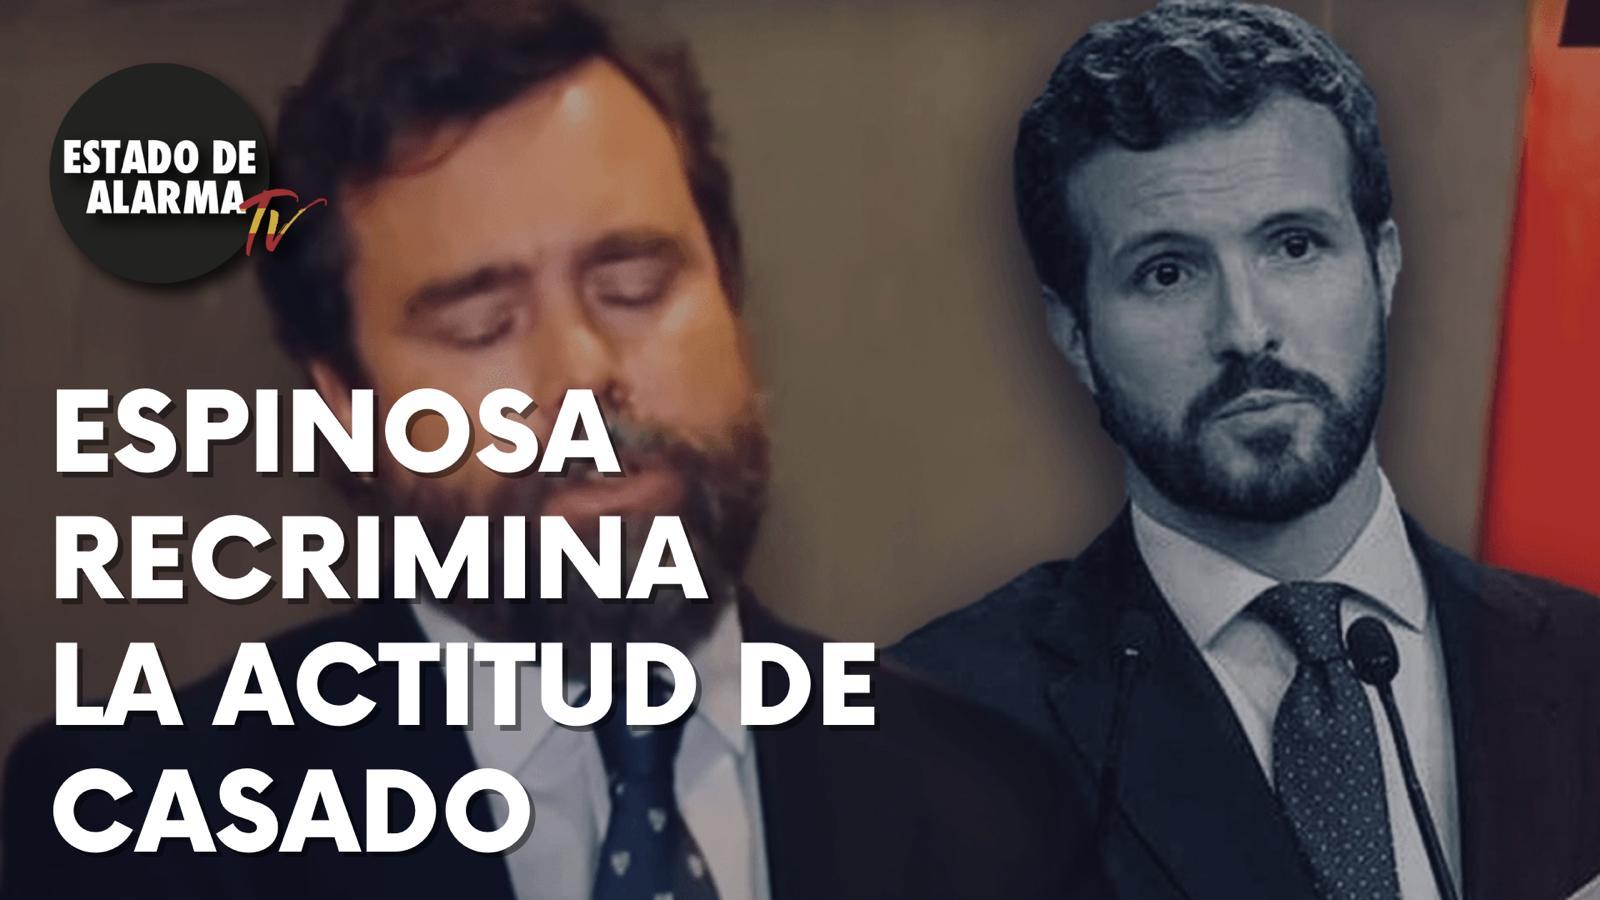 ¿Qué opina Iván Espinosa de los ataques de Casado a Abascal?